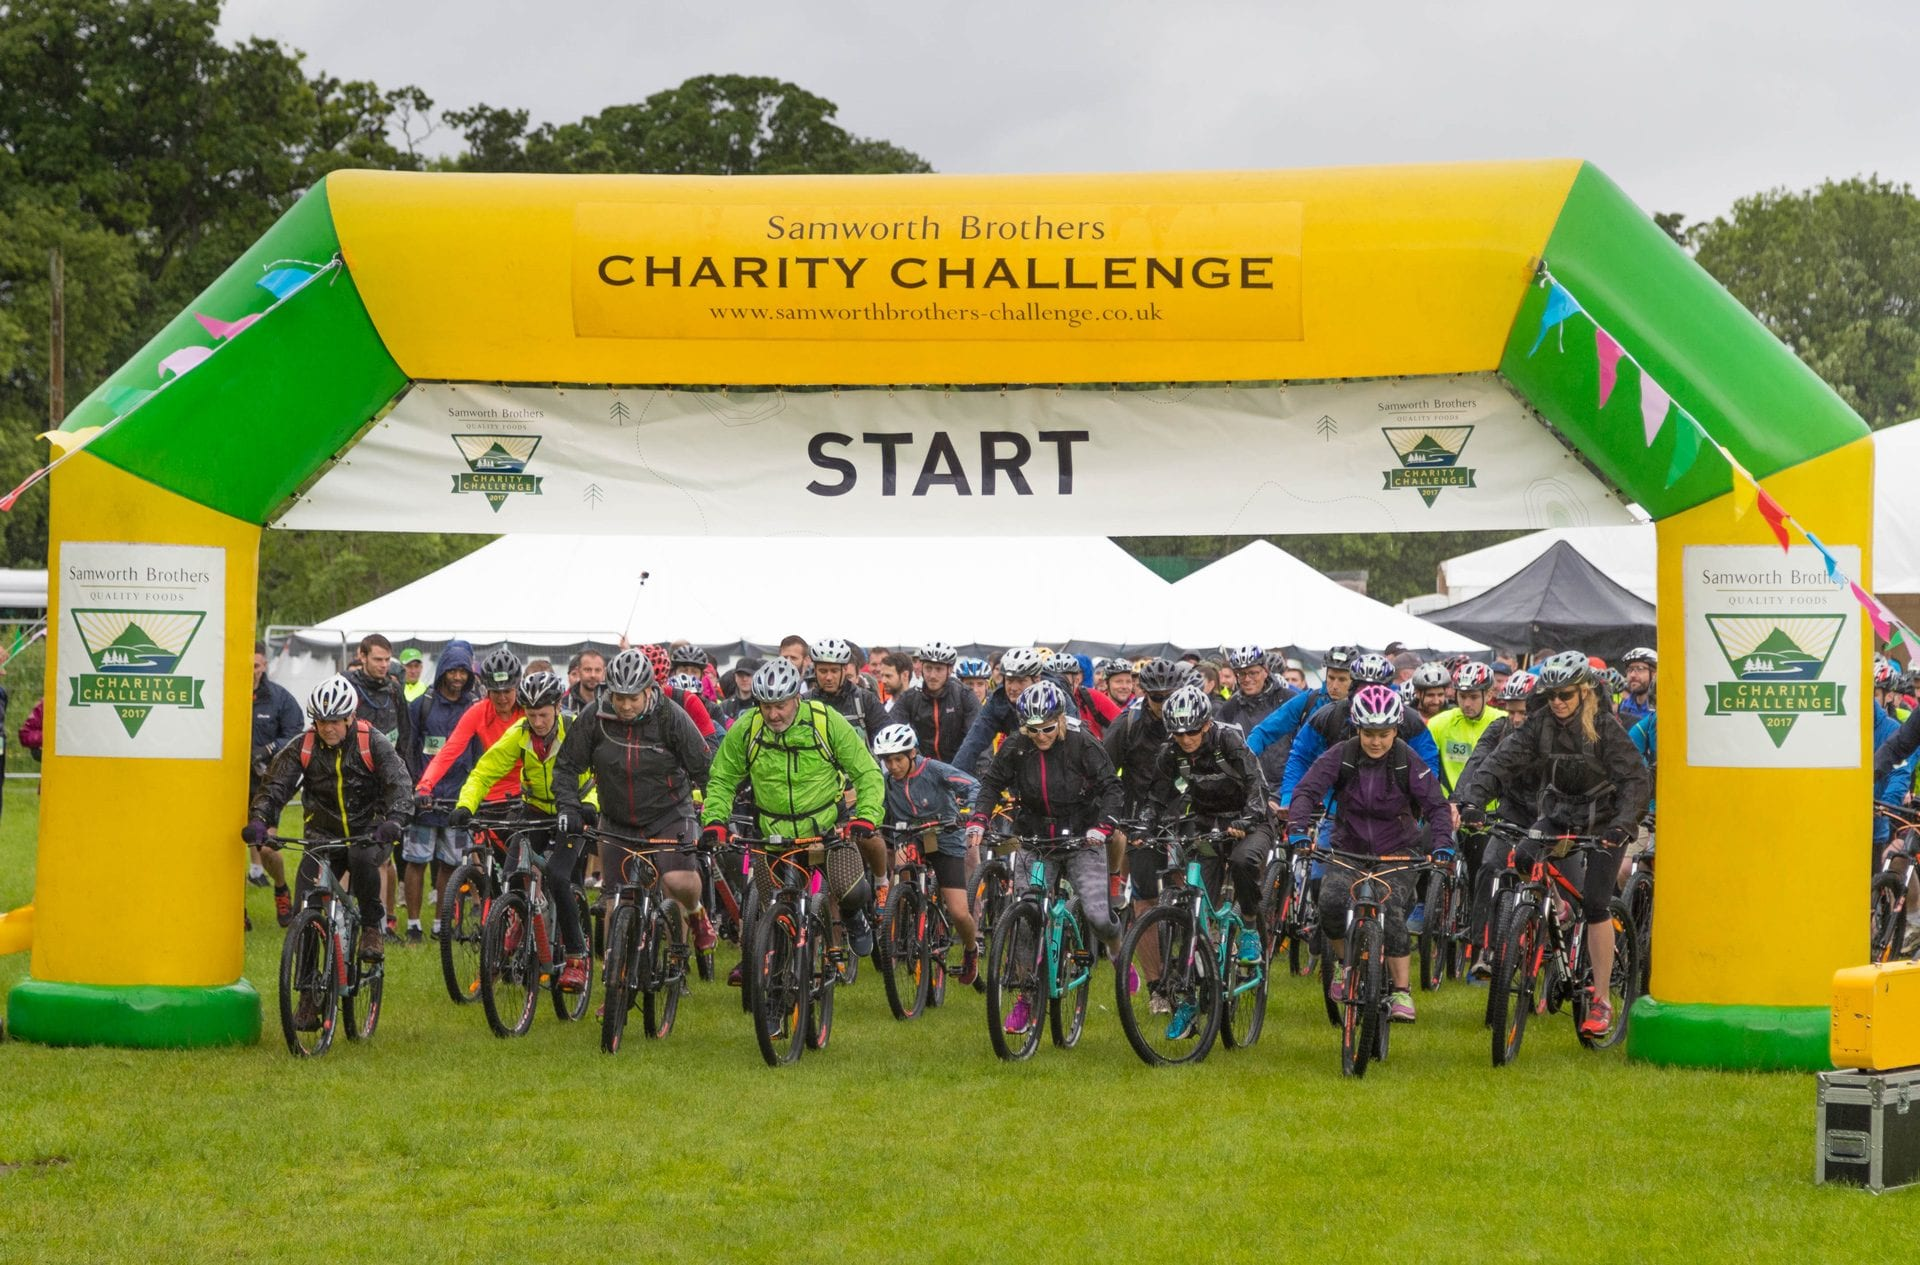 Charity challenge start